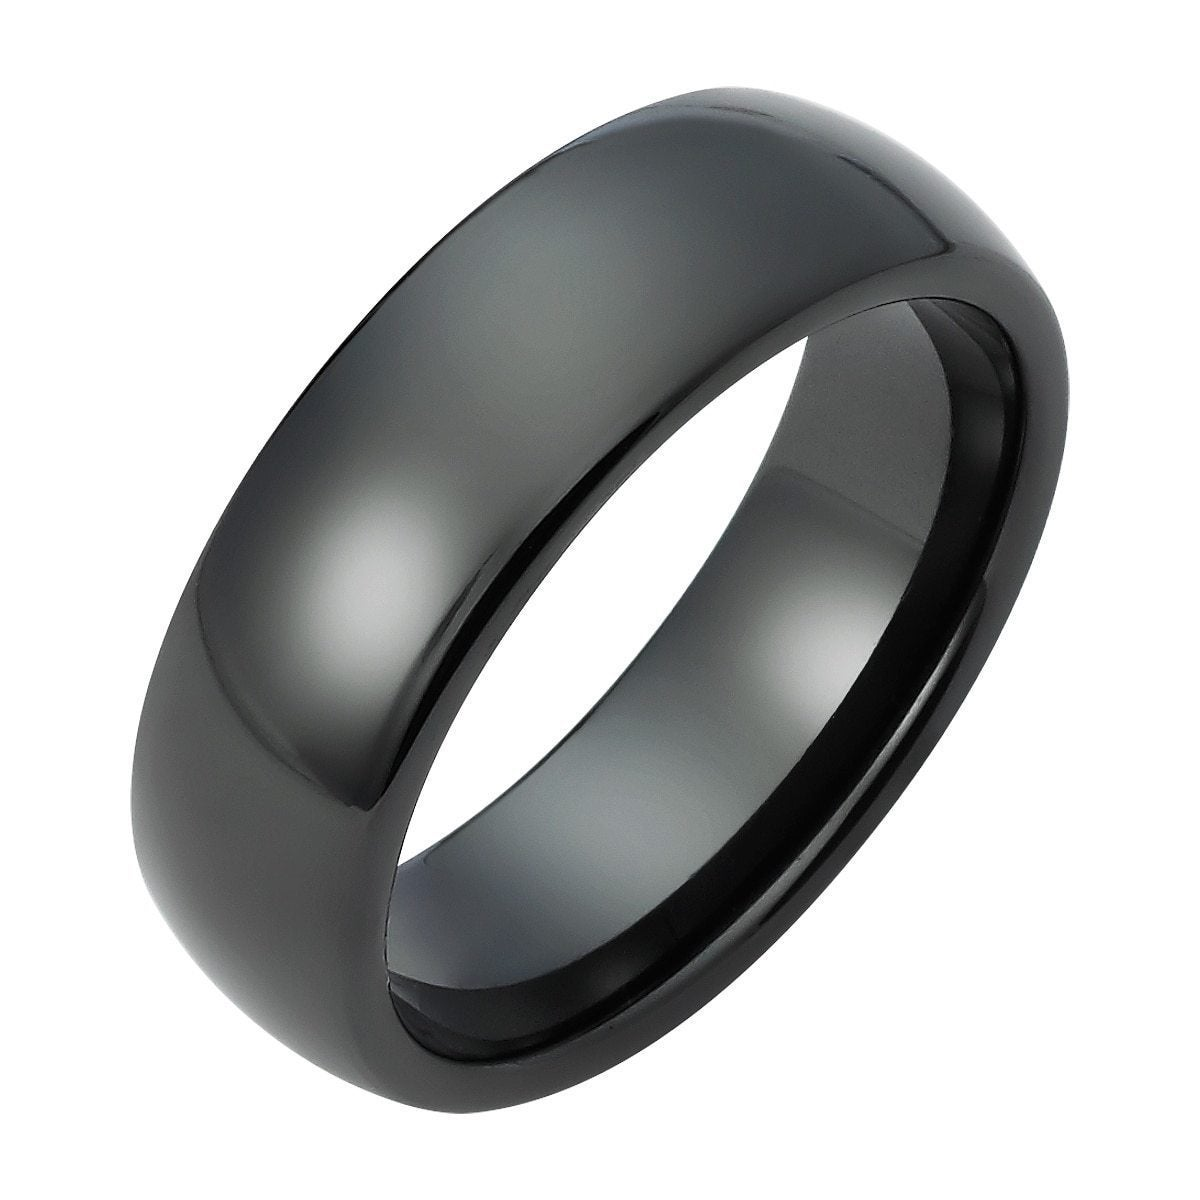 Boston Bay Diamonds Men S 7mm Comfort Fit Black Ceramic Wedding Band Ring Free Shipping Today 18526259